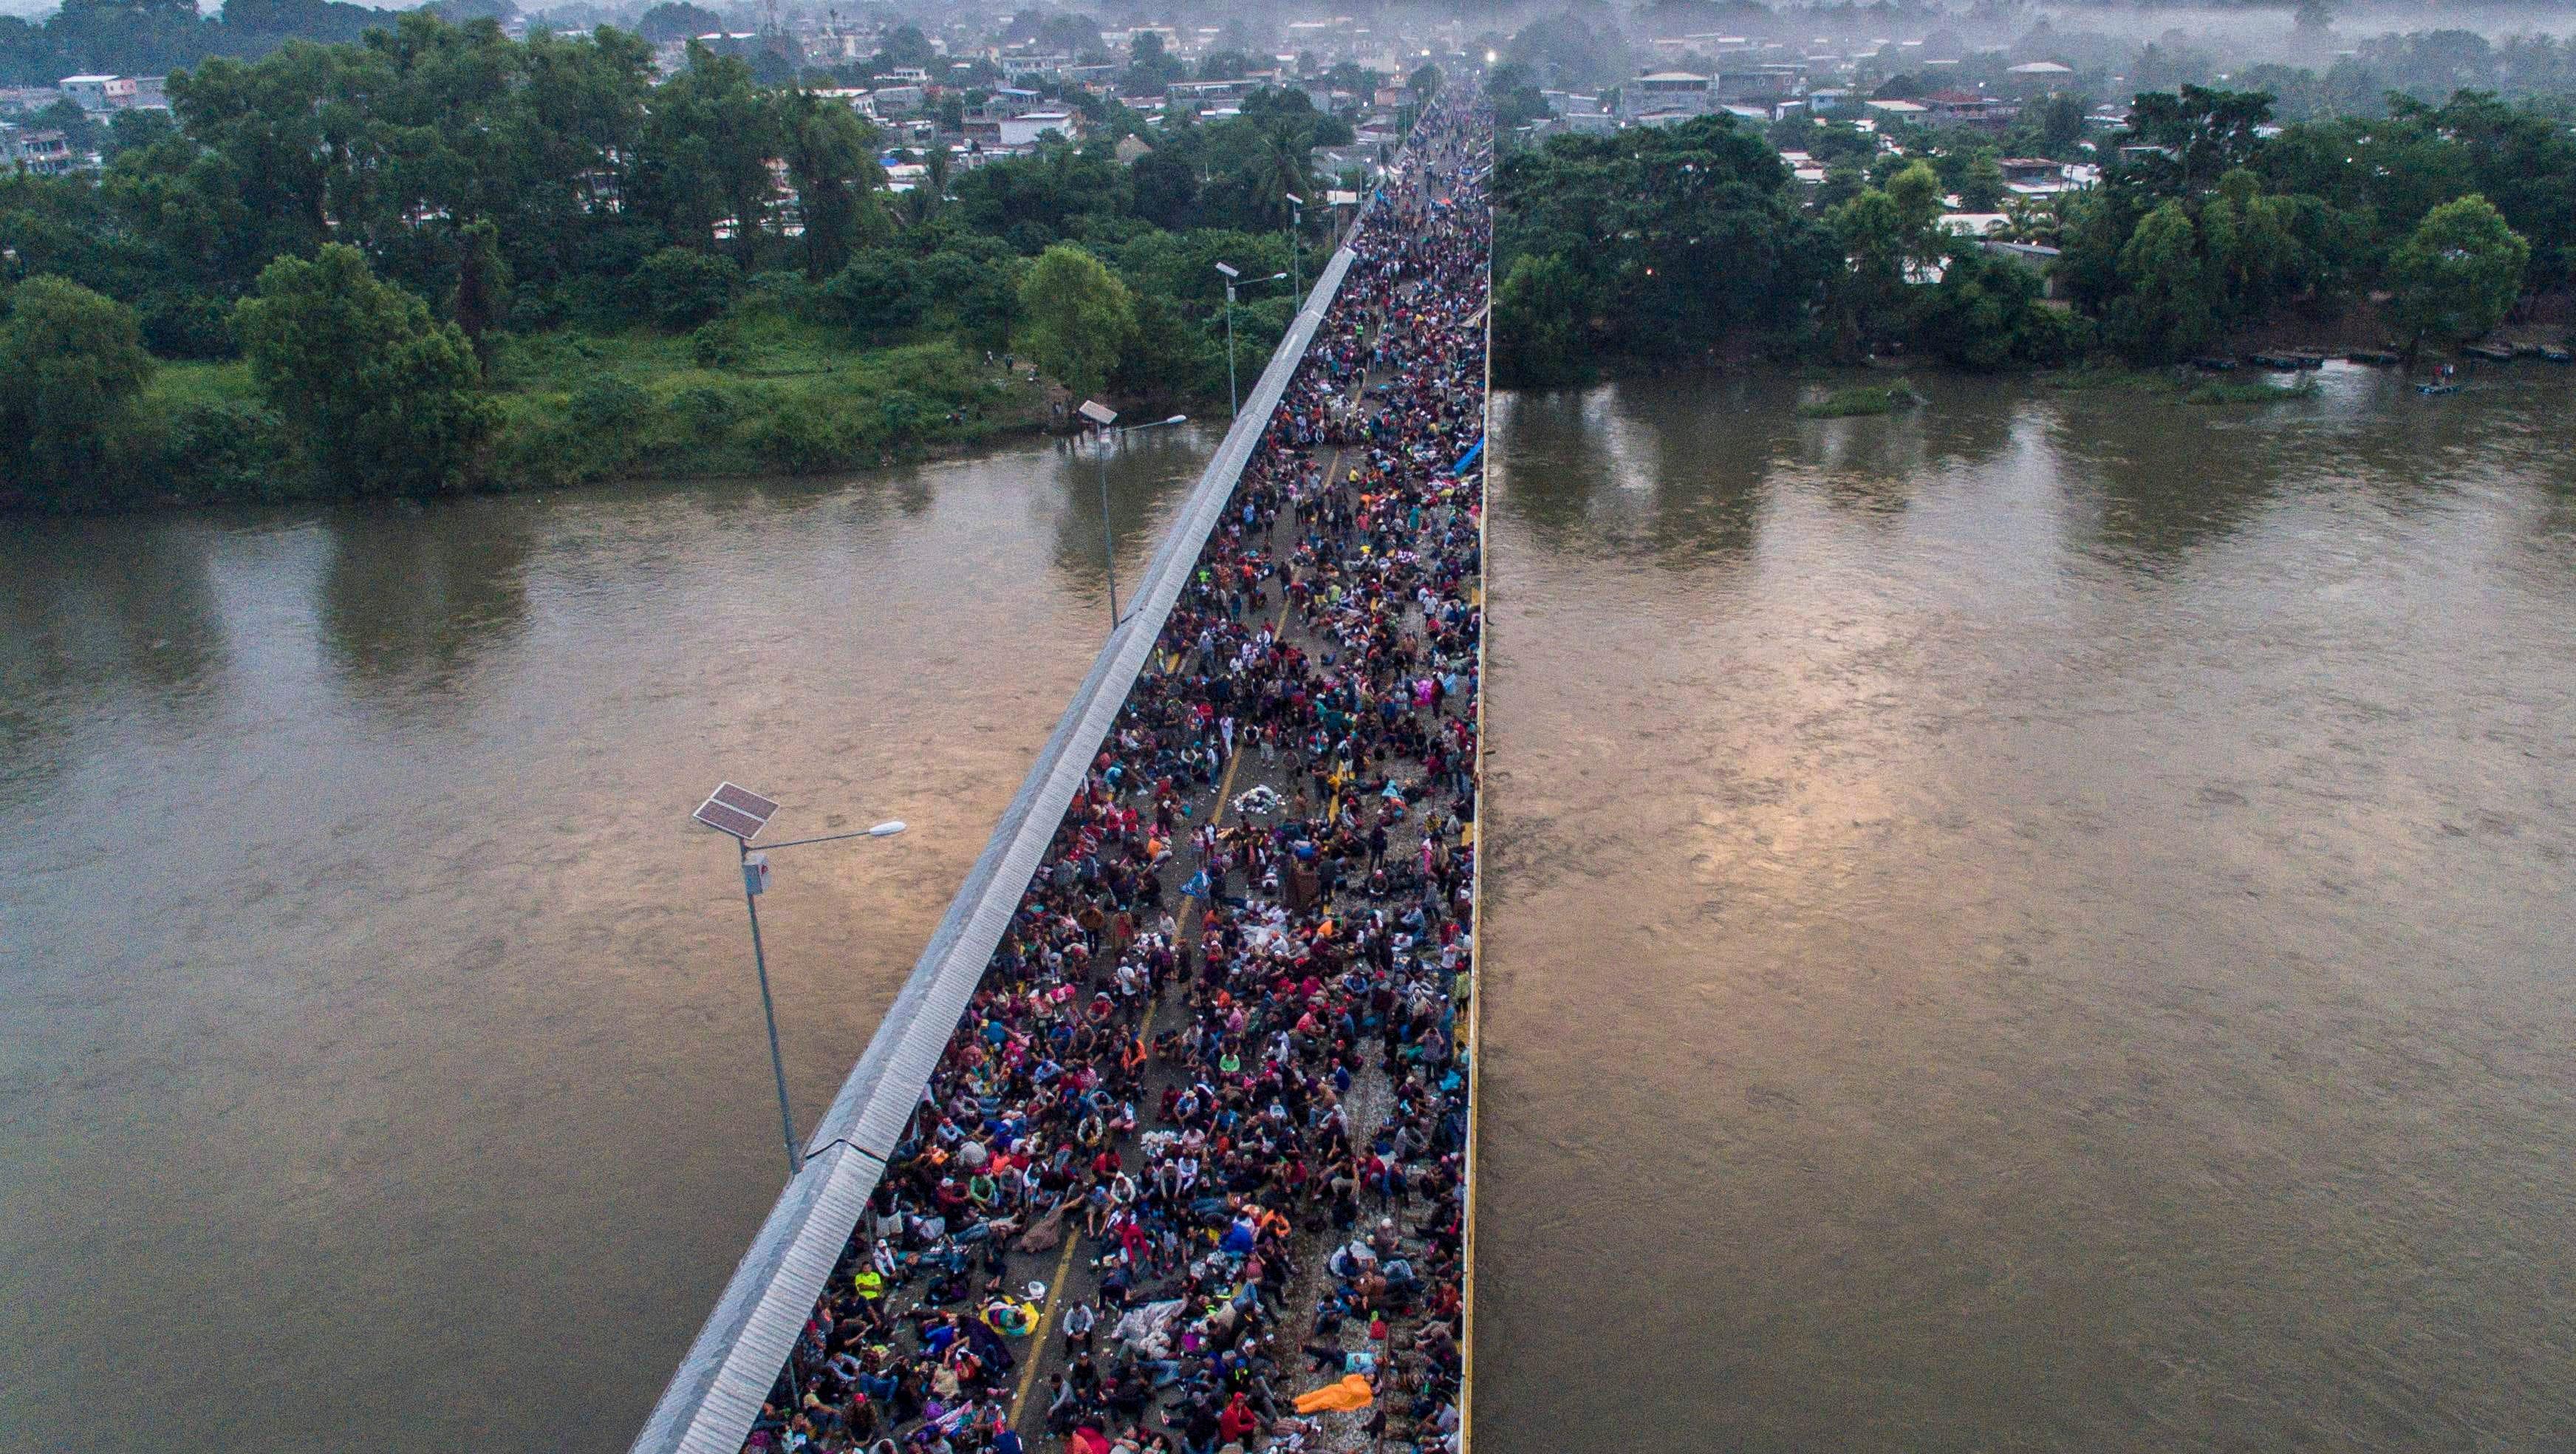 Aerial view of a Honduran migrant caravan heading to the US, on the Guatemala-Mexico international border bridge in Ciudad Hidalgo, Chiapas state, Mexico, on Oct. 20, 2018.